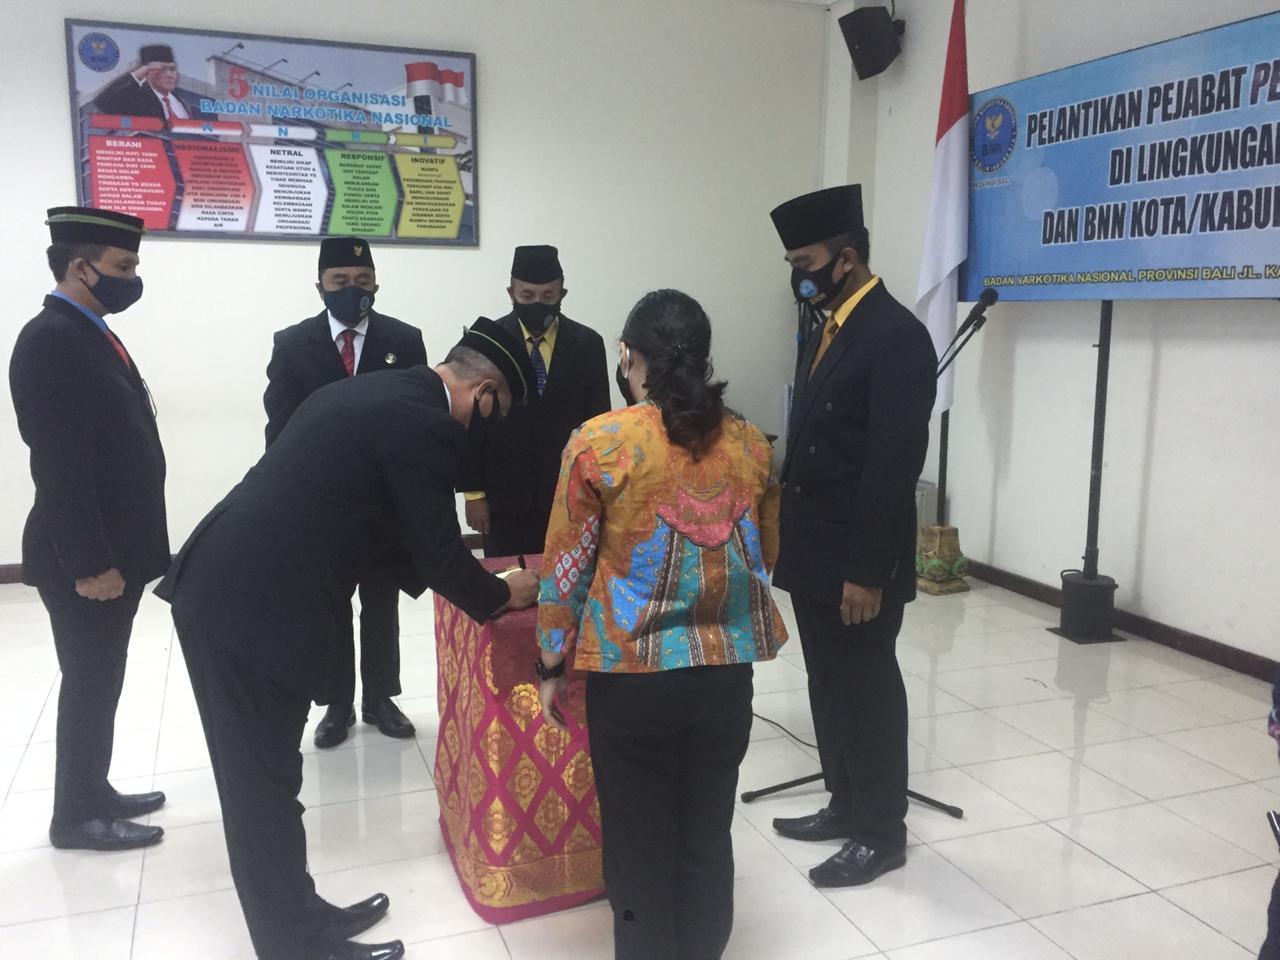 KEPALA BNN Provinsi Bali Brigjen I Putu Gede Suastawa memimpin Sertijab Kepala BNN Kota Denpasar dan Kabupaten Gianyar, Jumat (7/8). Foto: ist